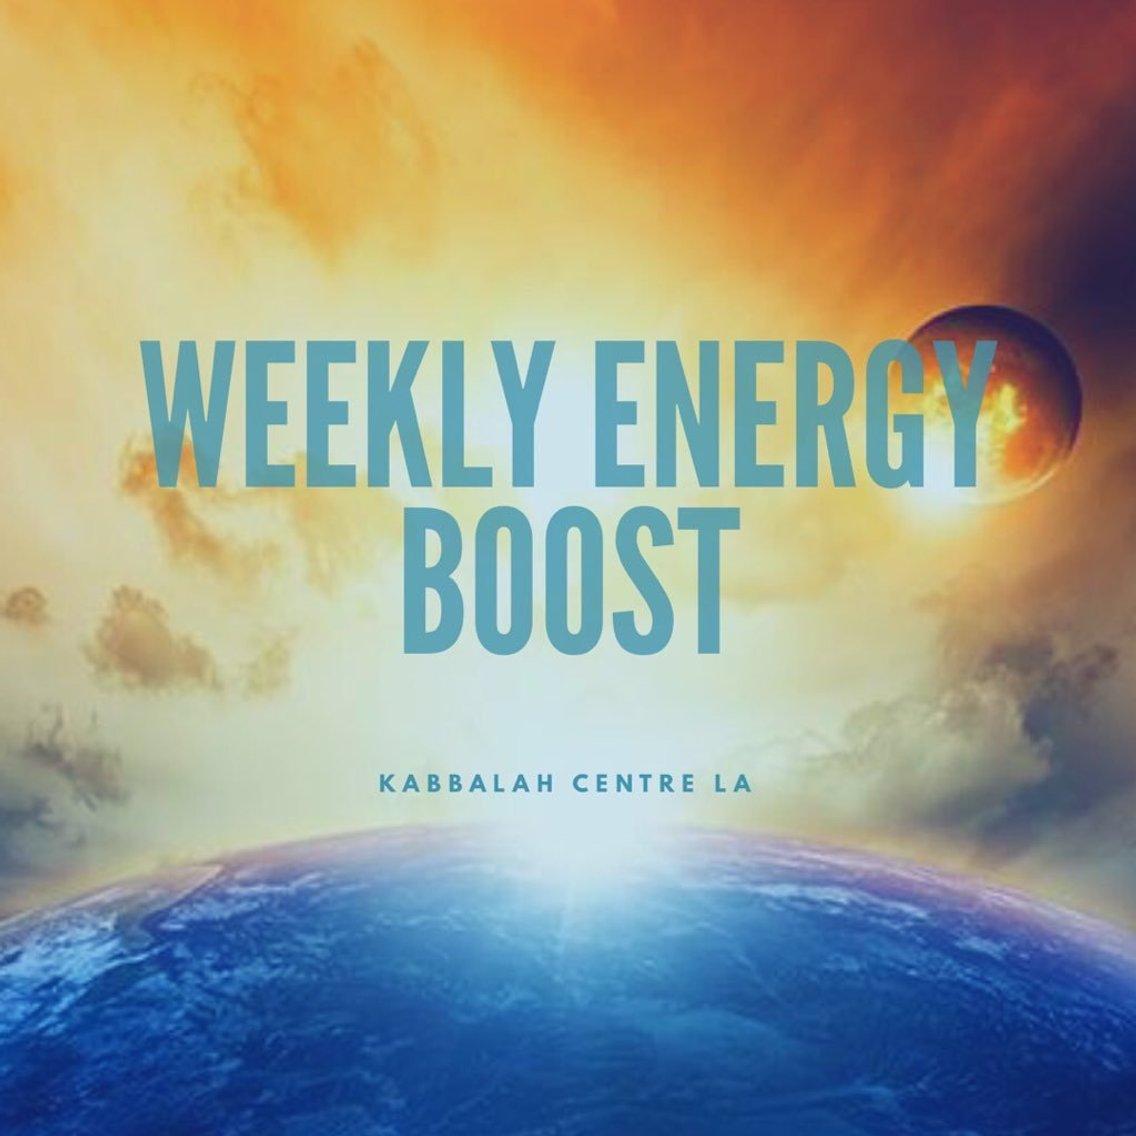 Weekly Energy Boost - immagine di copertina